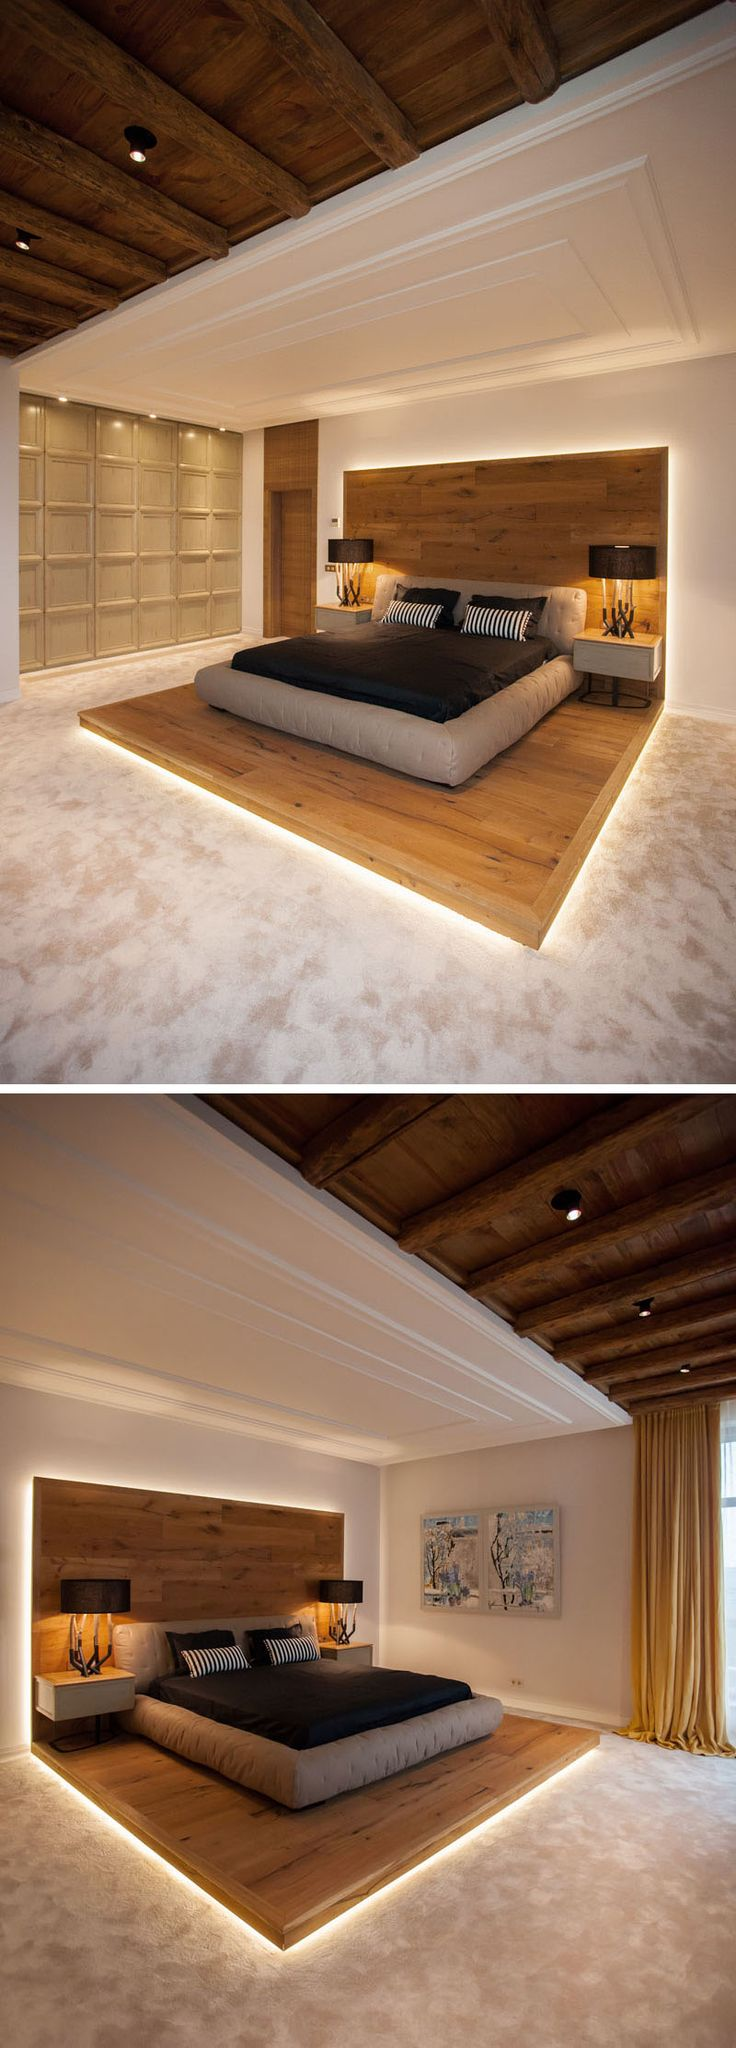 Best modern bedroom ideas - Best 25 Modern Bedrooms Ideas On Pinterest Modern Bedroom